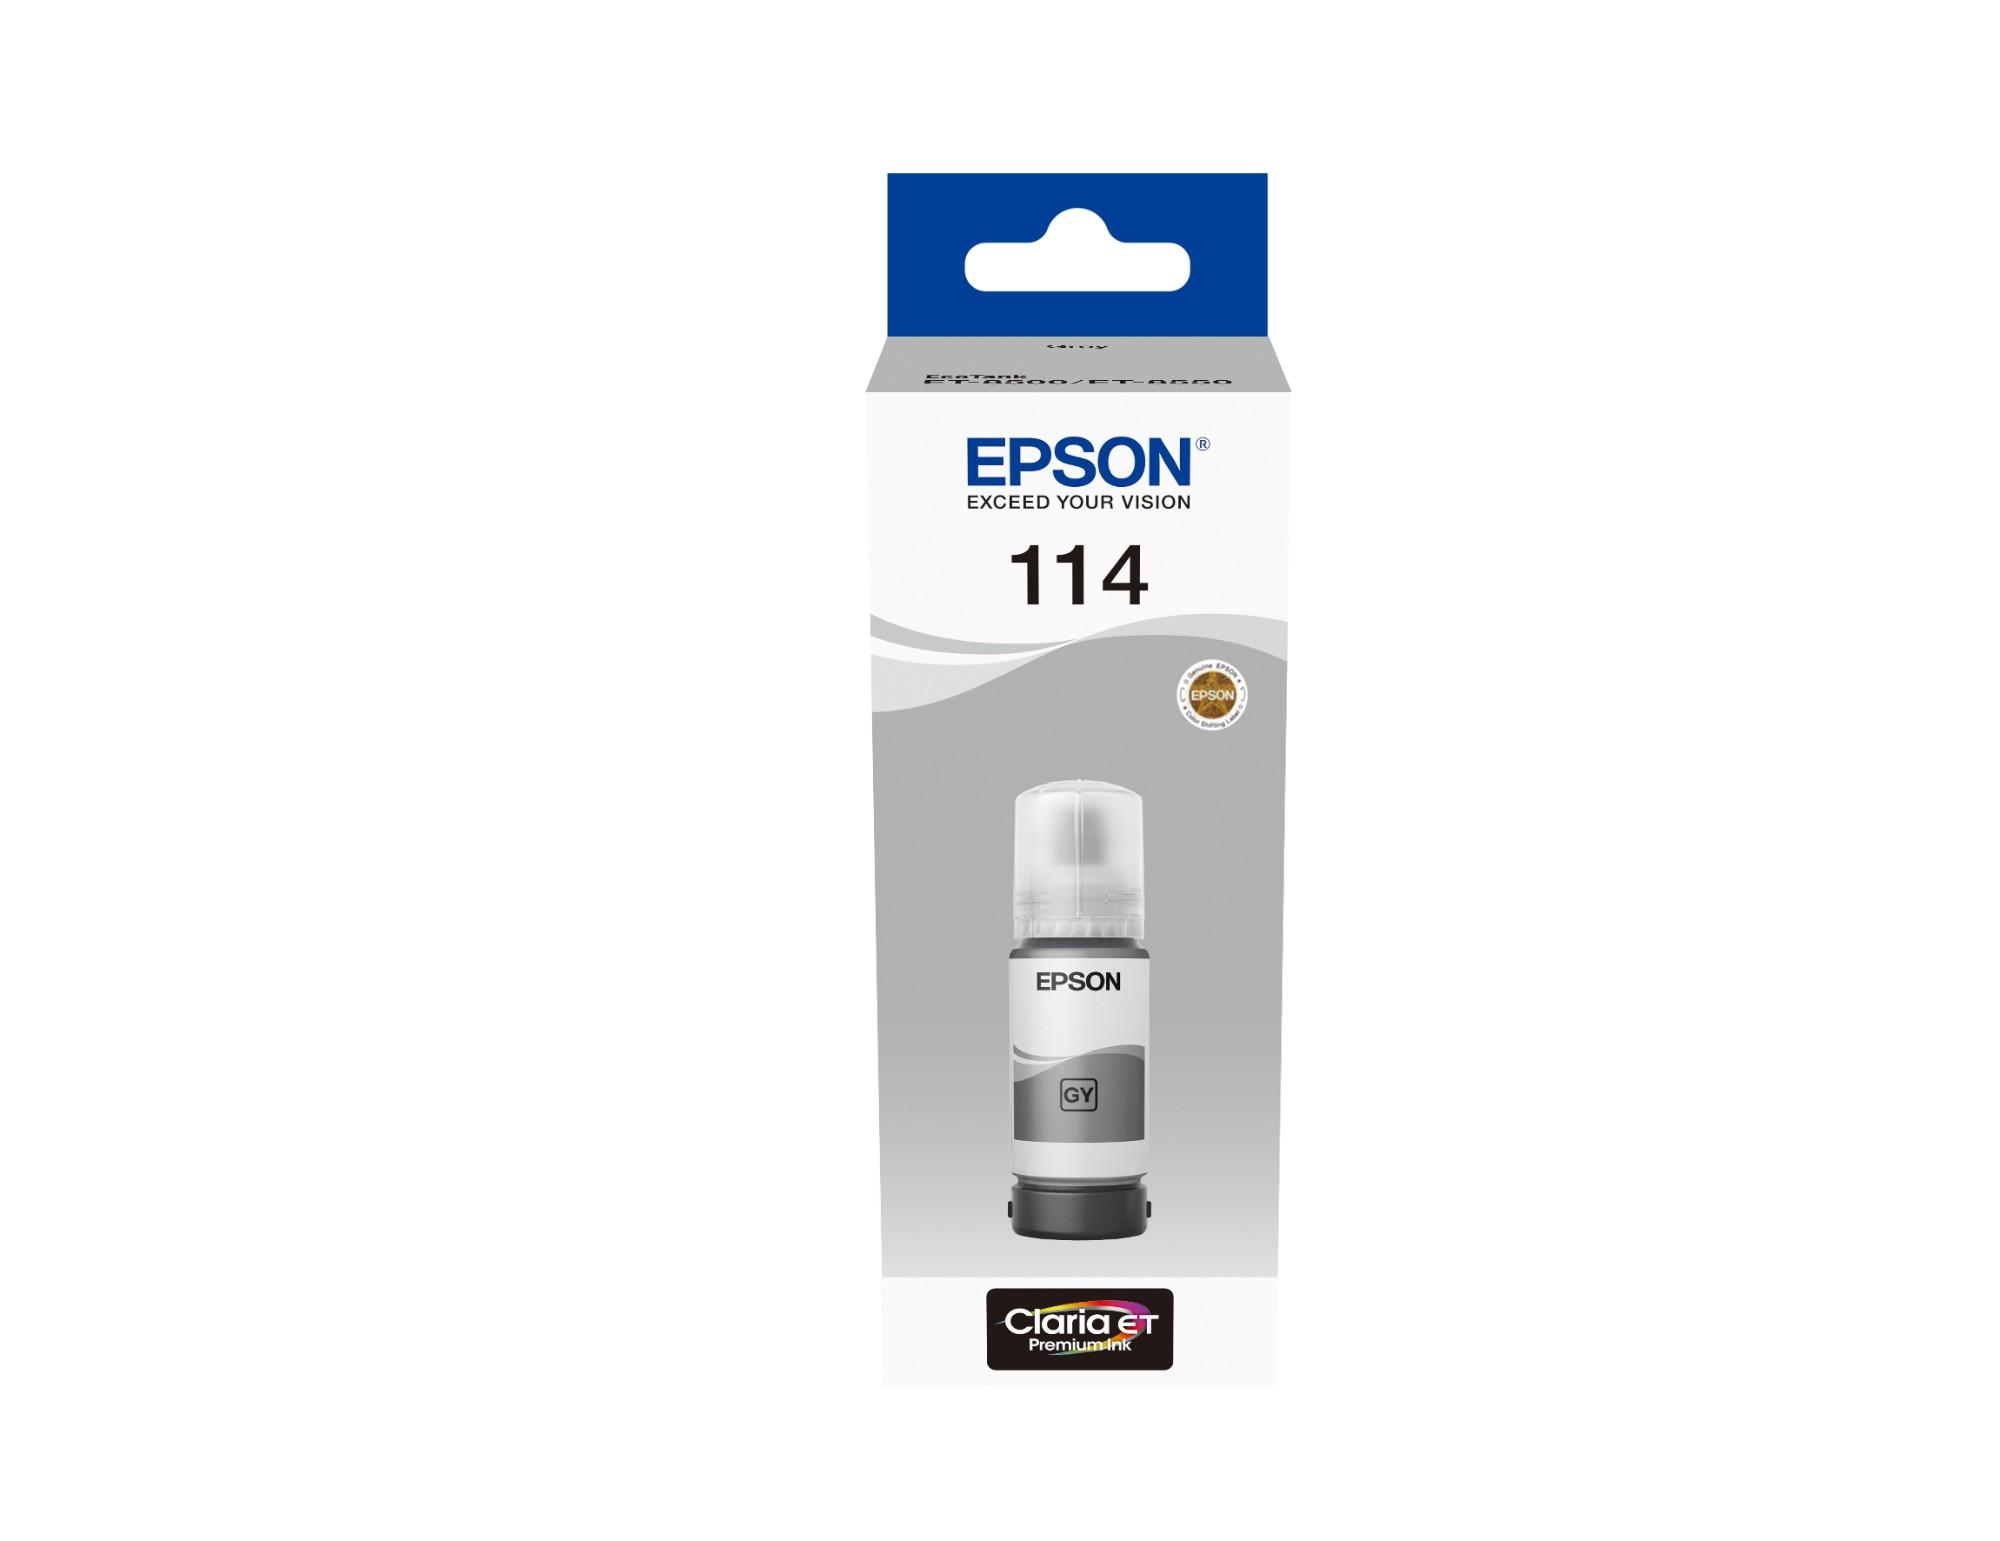 Epson C13T07B540 (114) Ink cartridge gray, 70ml